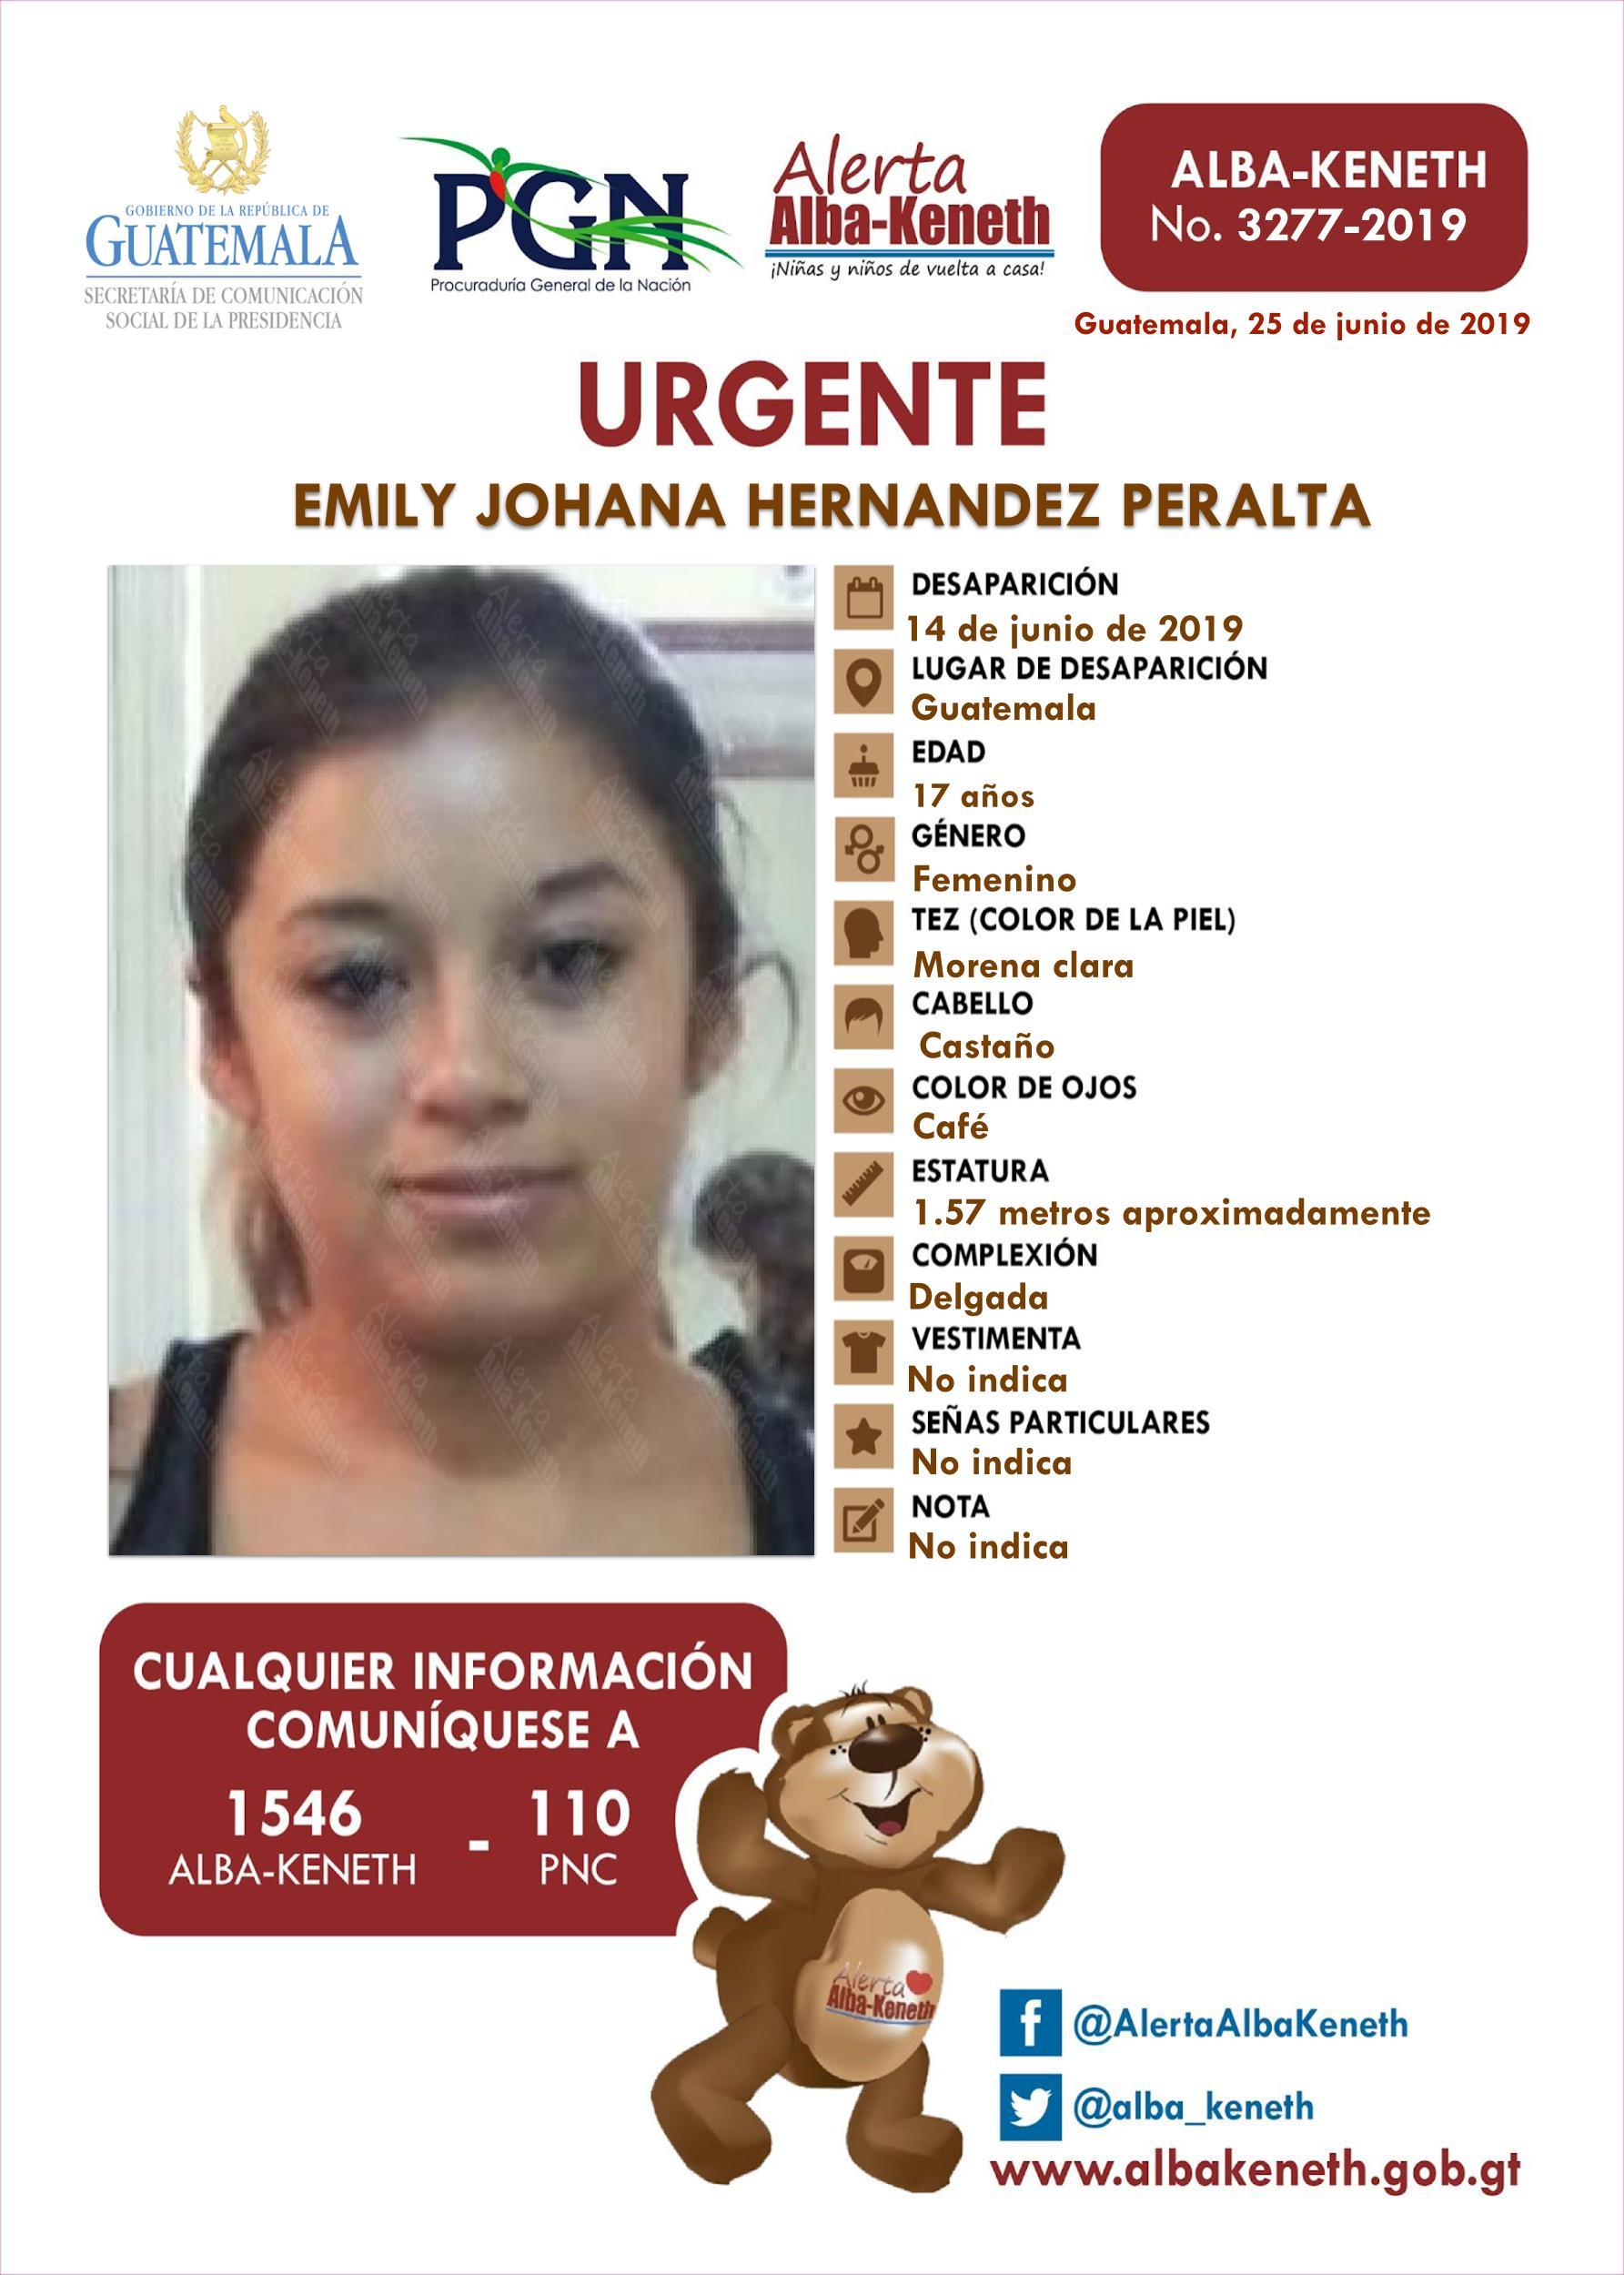 Emily Johana Hernandez Peralta